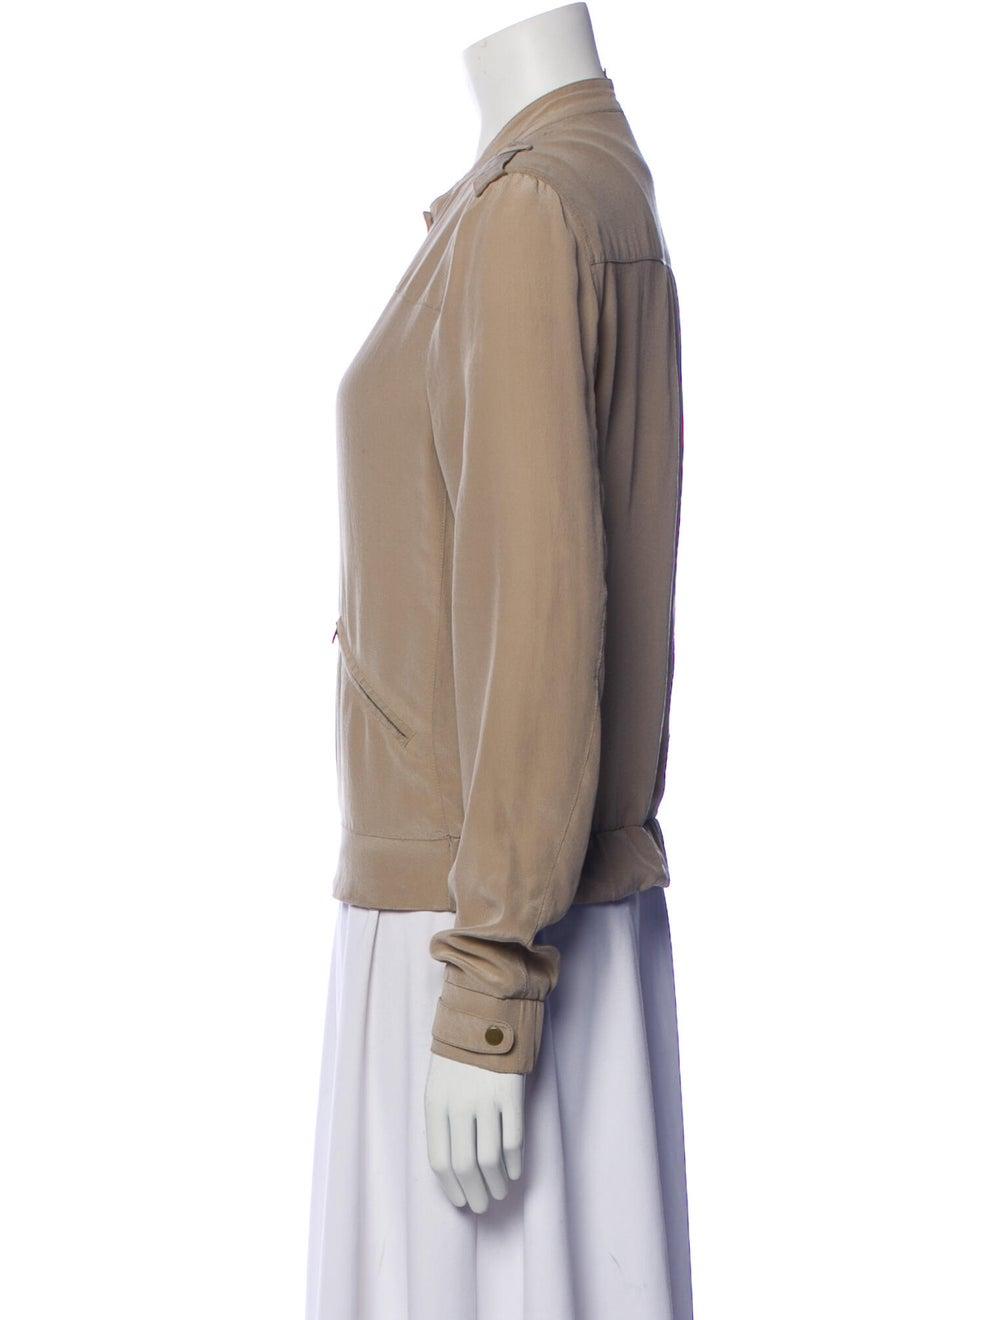 Edun Silk Bomber Jacket - image 2